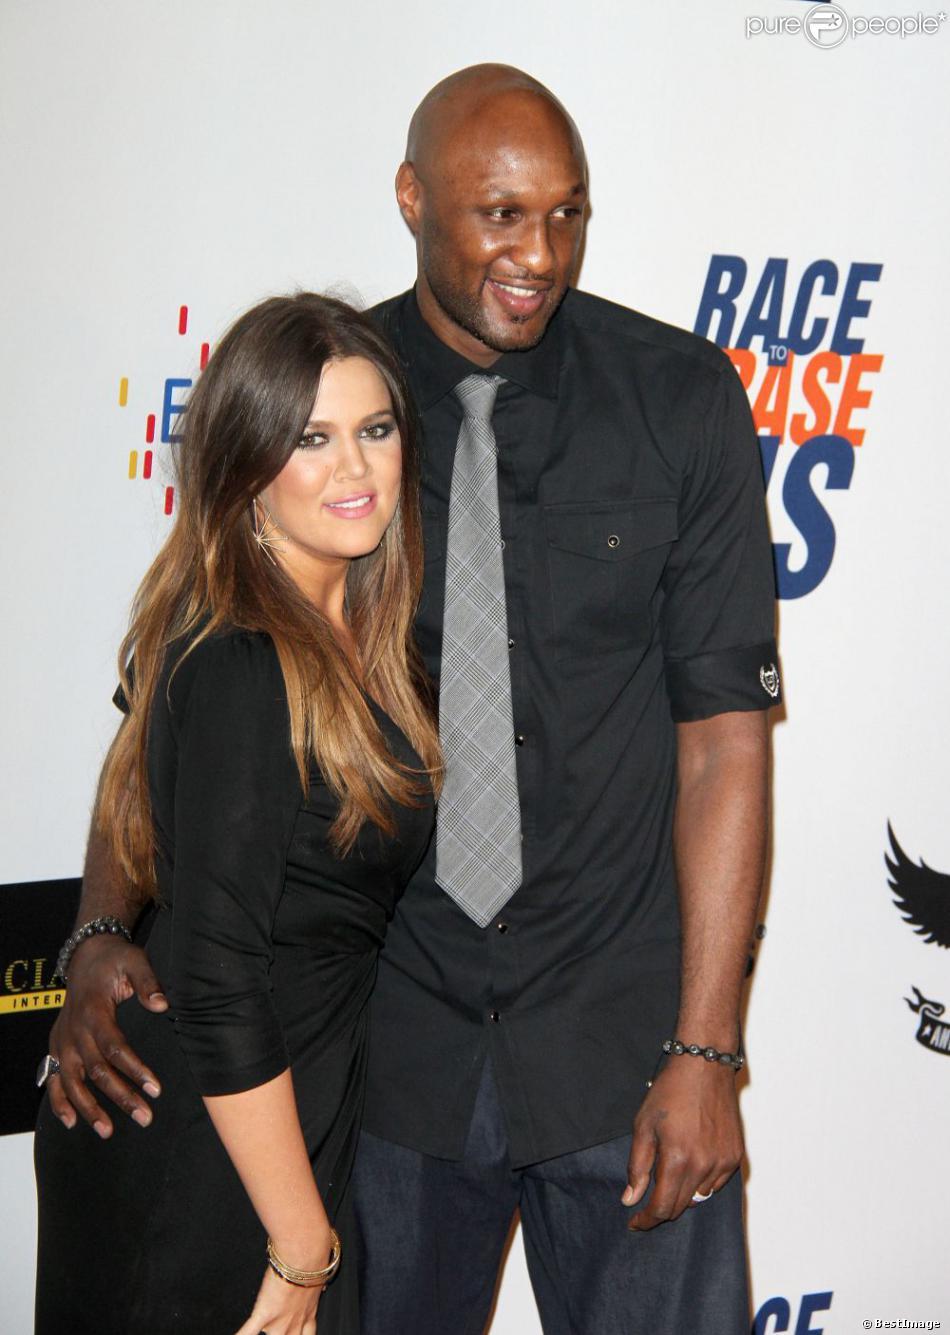 Khloe Kardashian et Lamar Odom le 18 mai 2012 à Los Angeles.